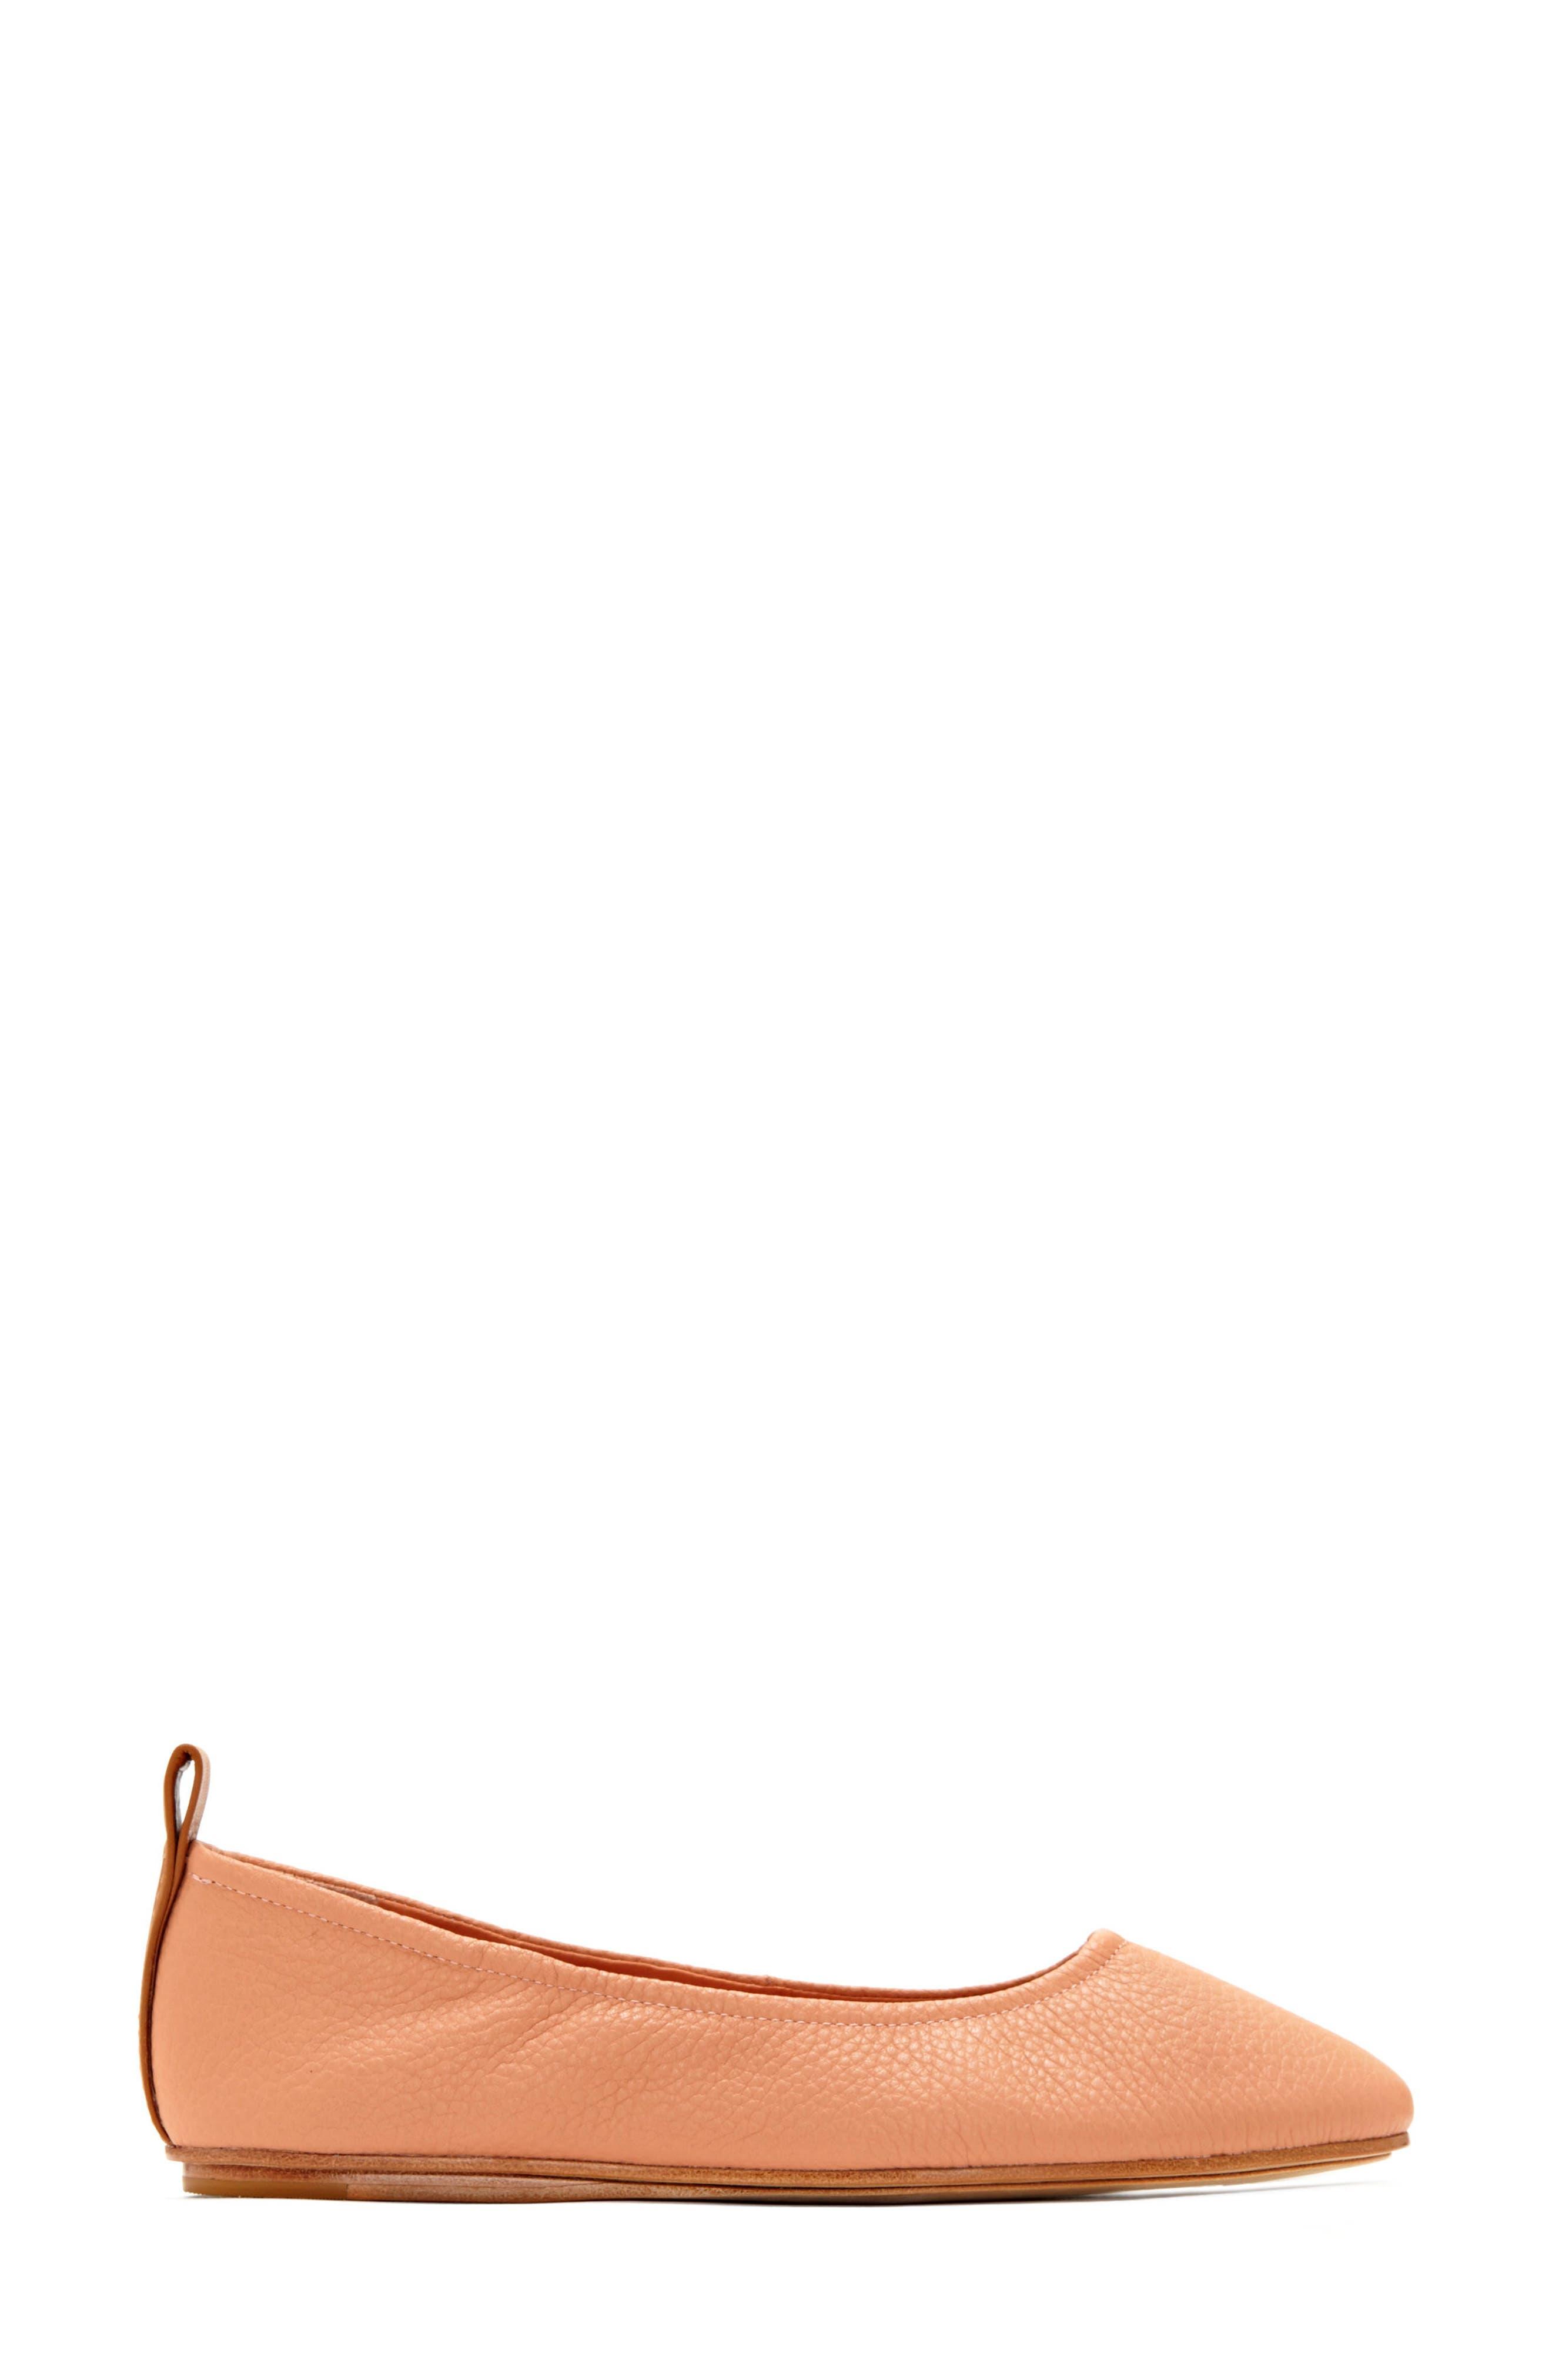 Carola Ballet Flat,                             Alternate thumbnail 46, color,